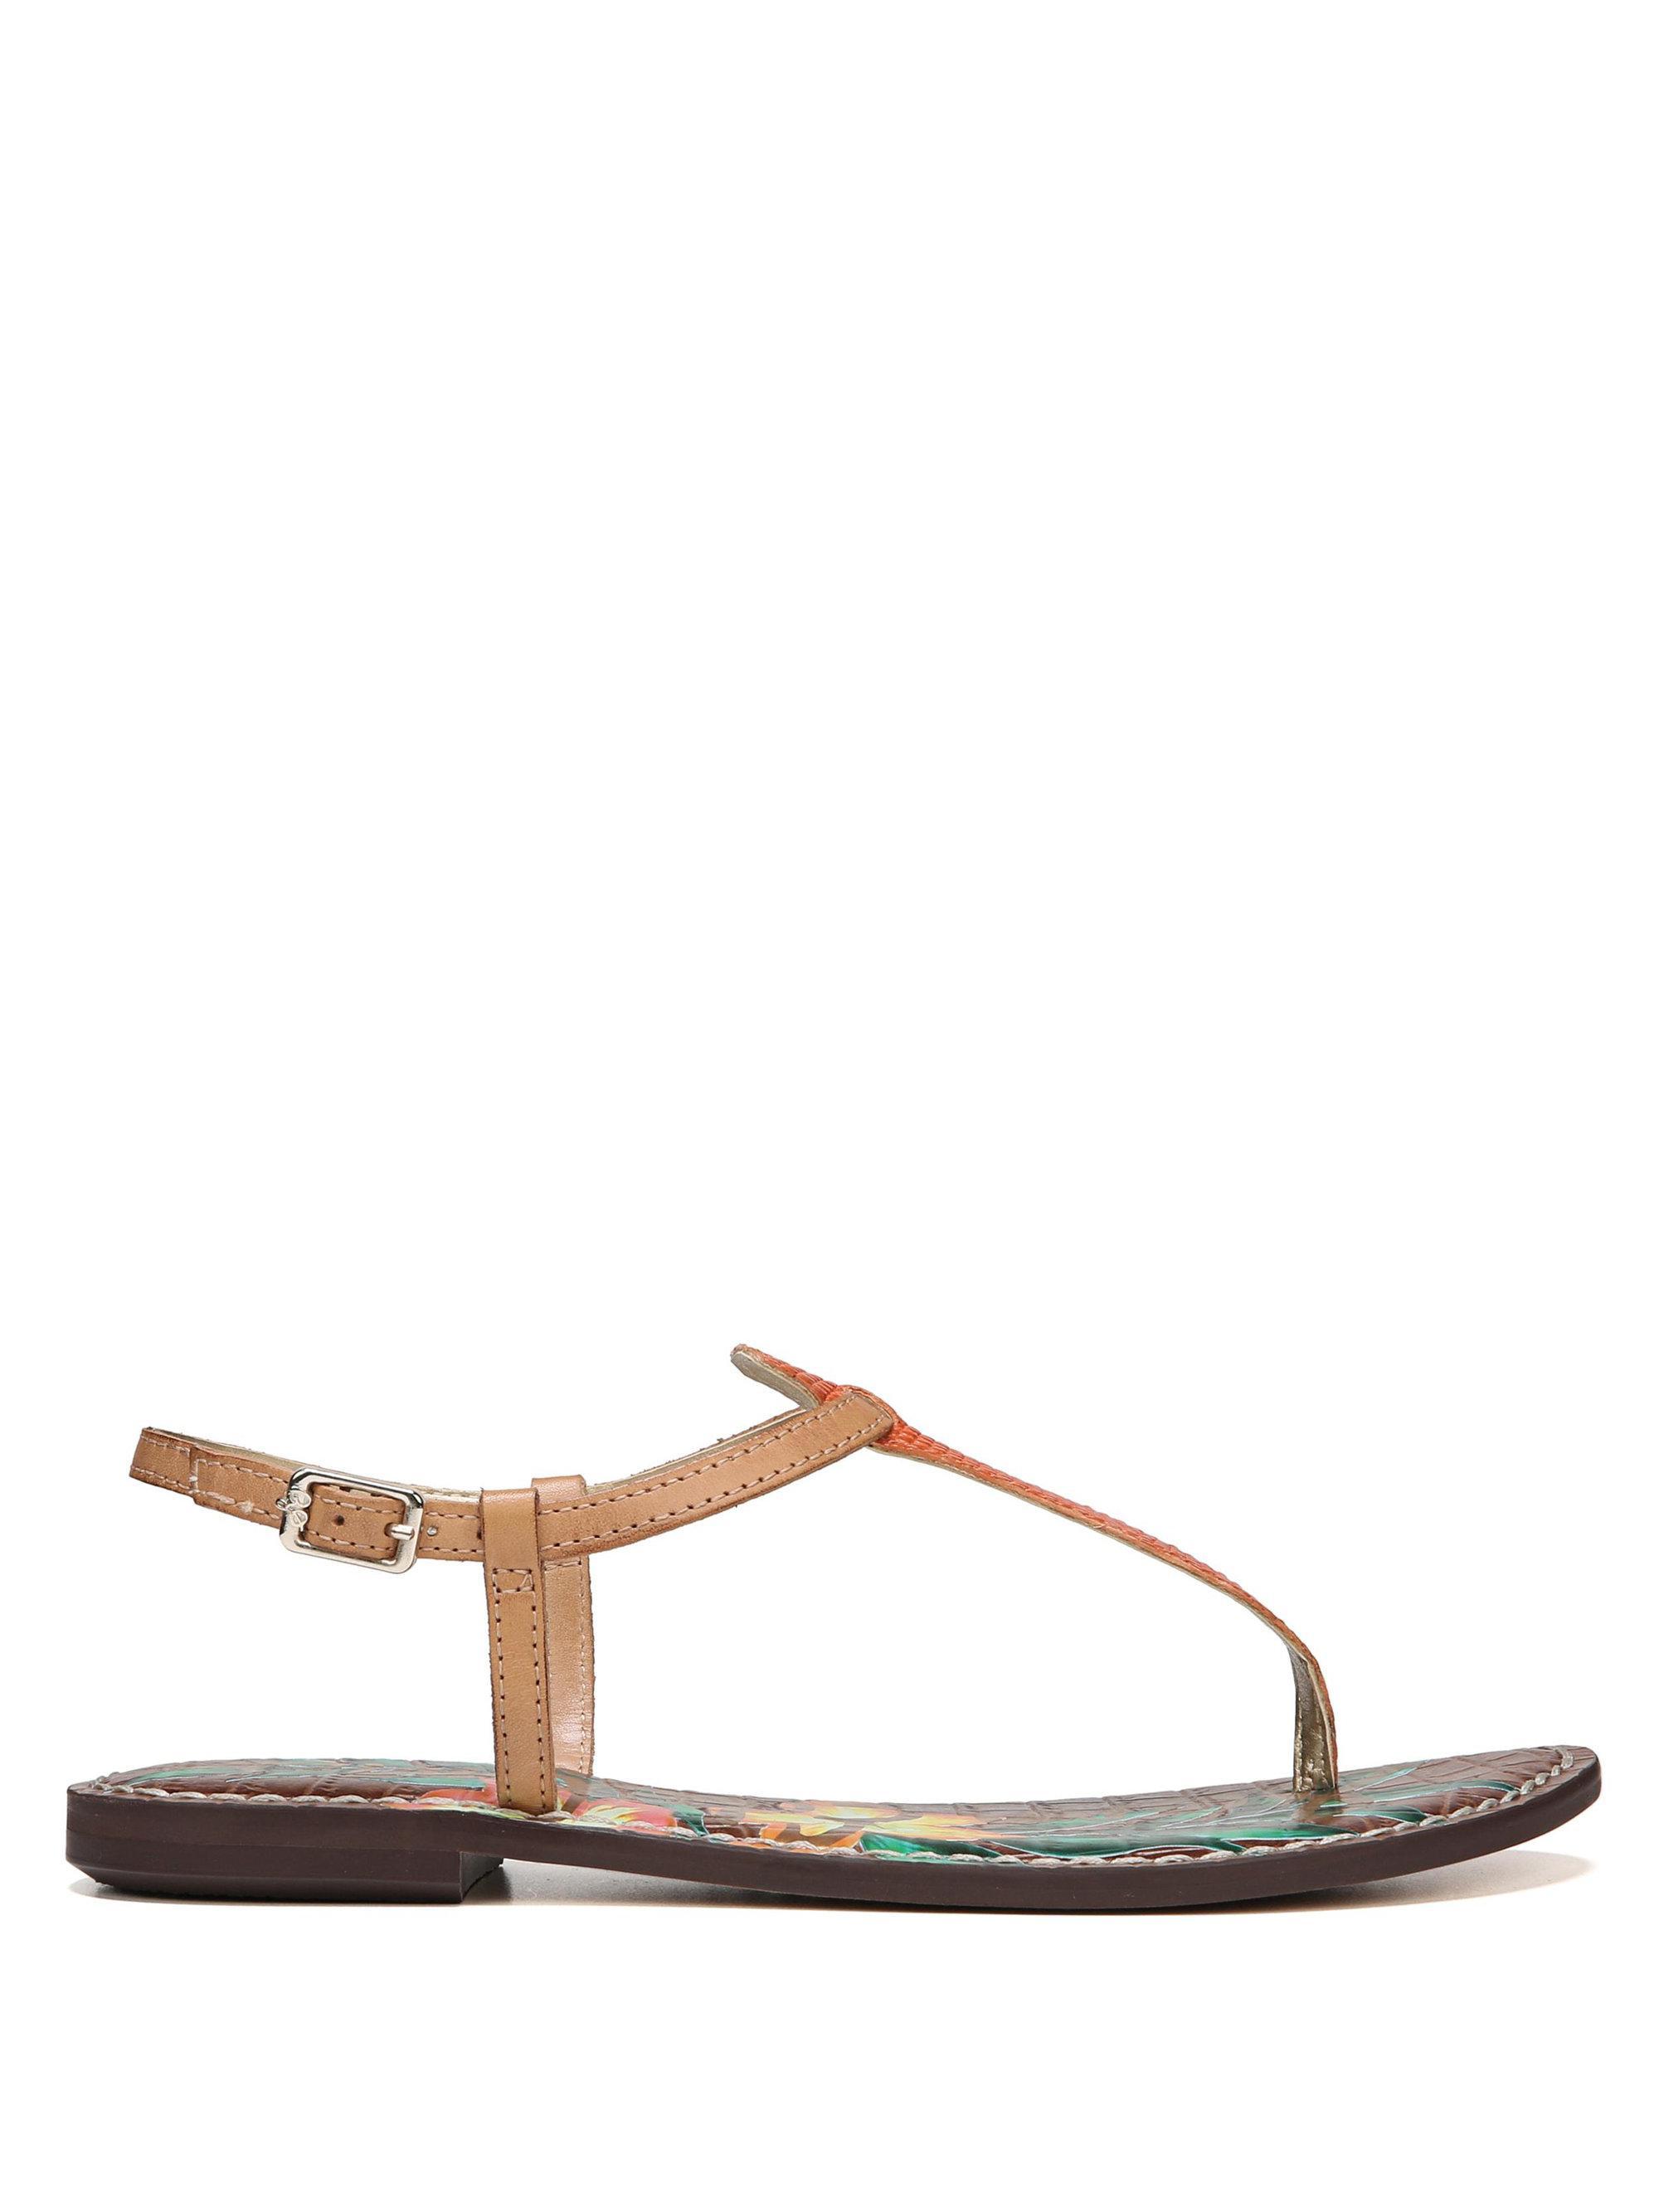 Sam Edelman Gigi Lizard Print Floral Leather Thong Sandals